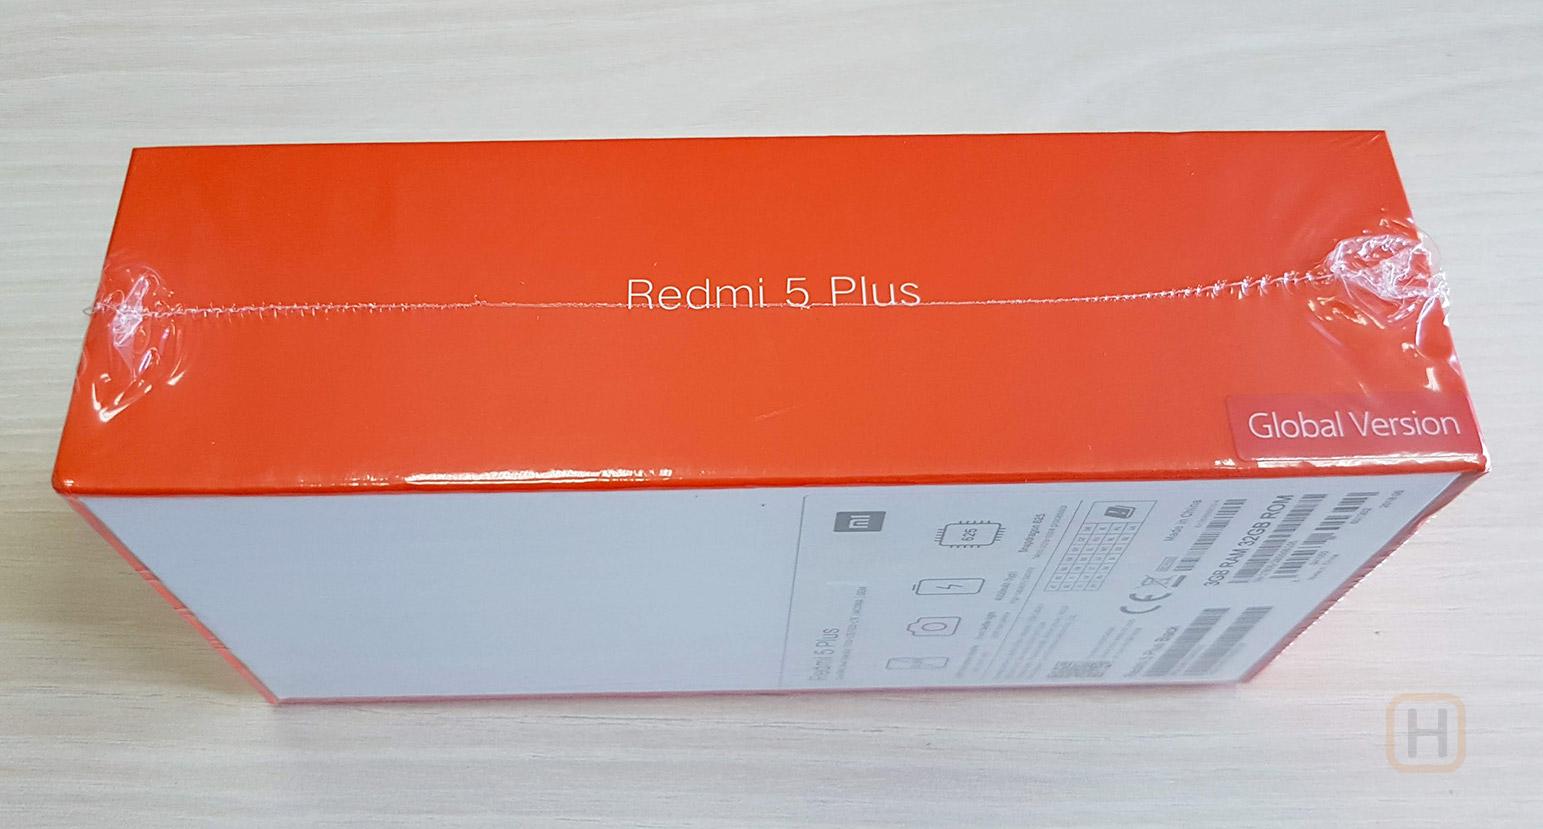 Redmi 5 Plus Global version